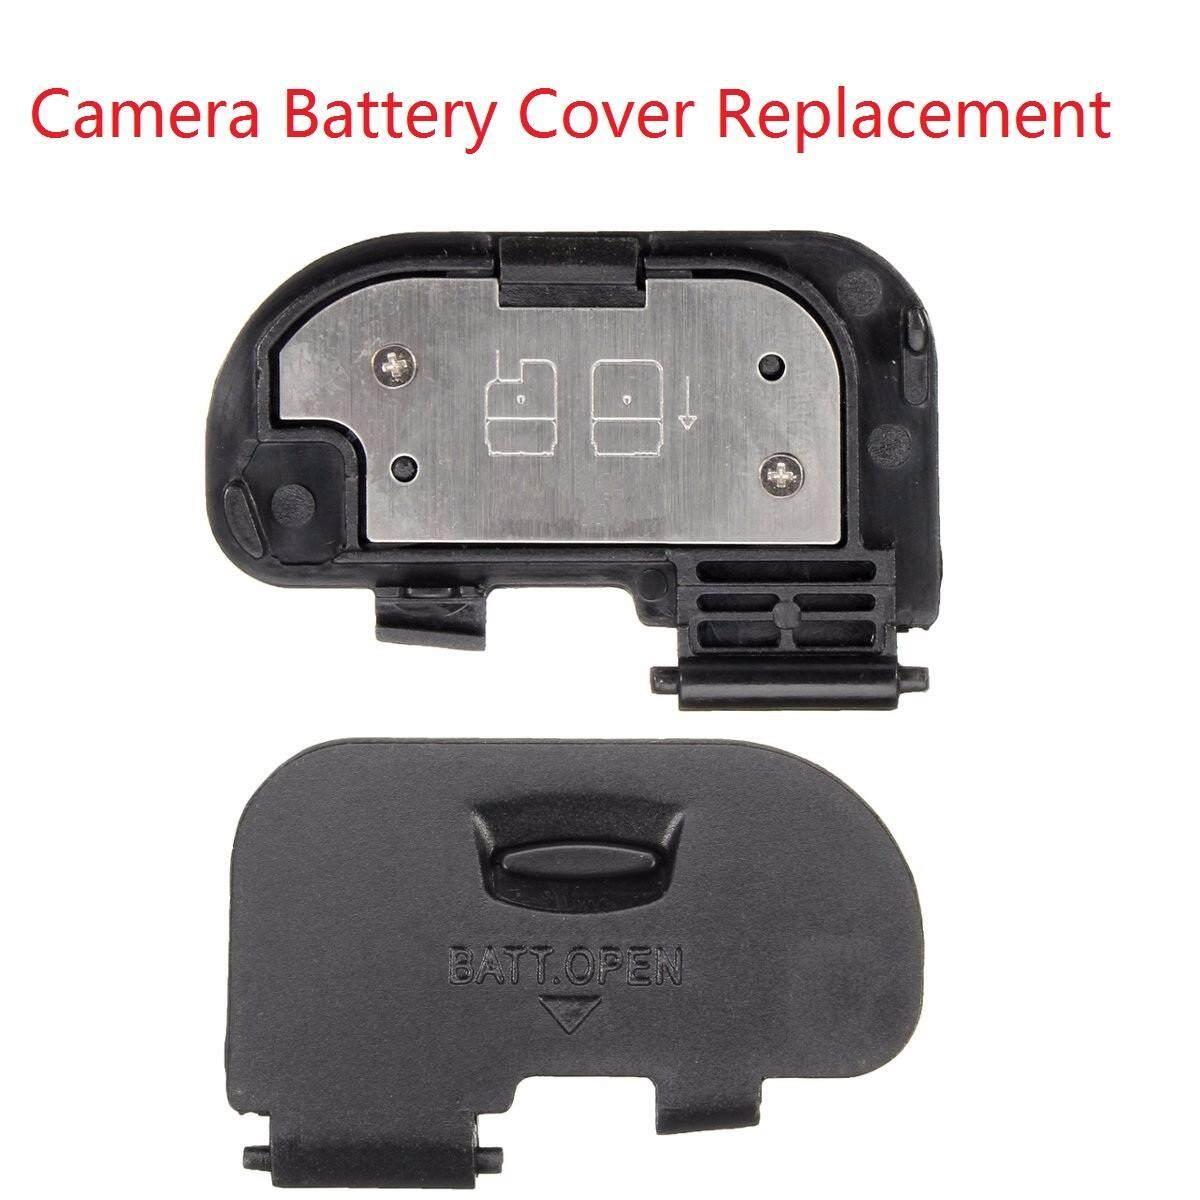 Baru Pengganti Kamera Pintu Baterai Cover Penutup Cangkir Perbaikan Bagian untuk Canon EOS 60D